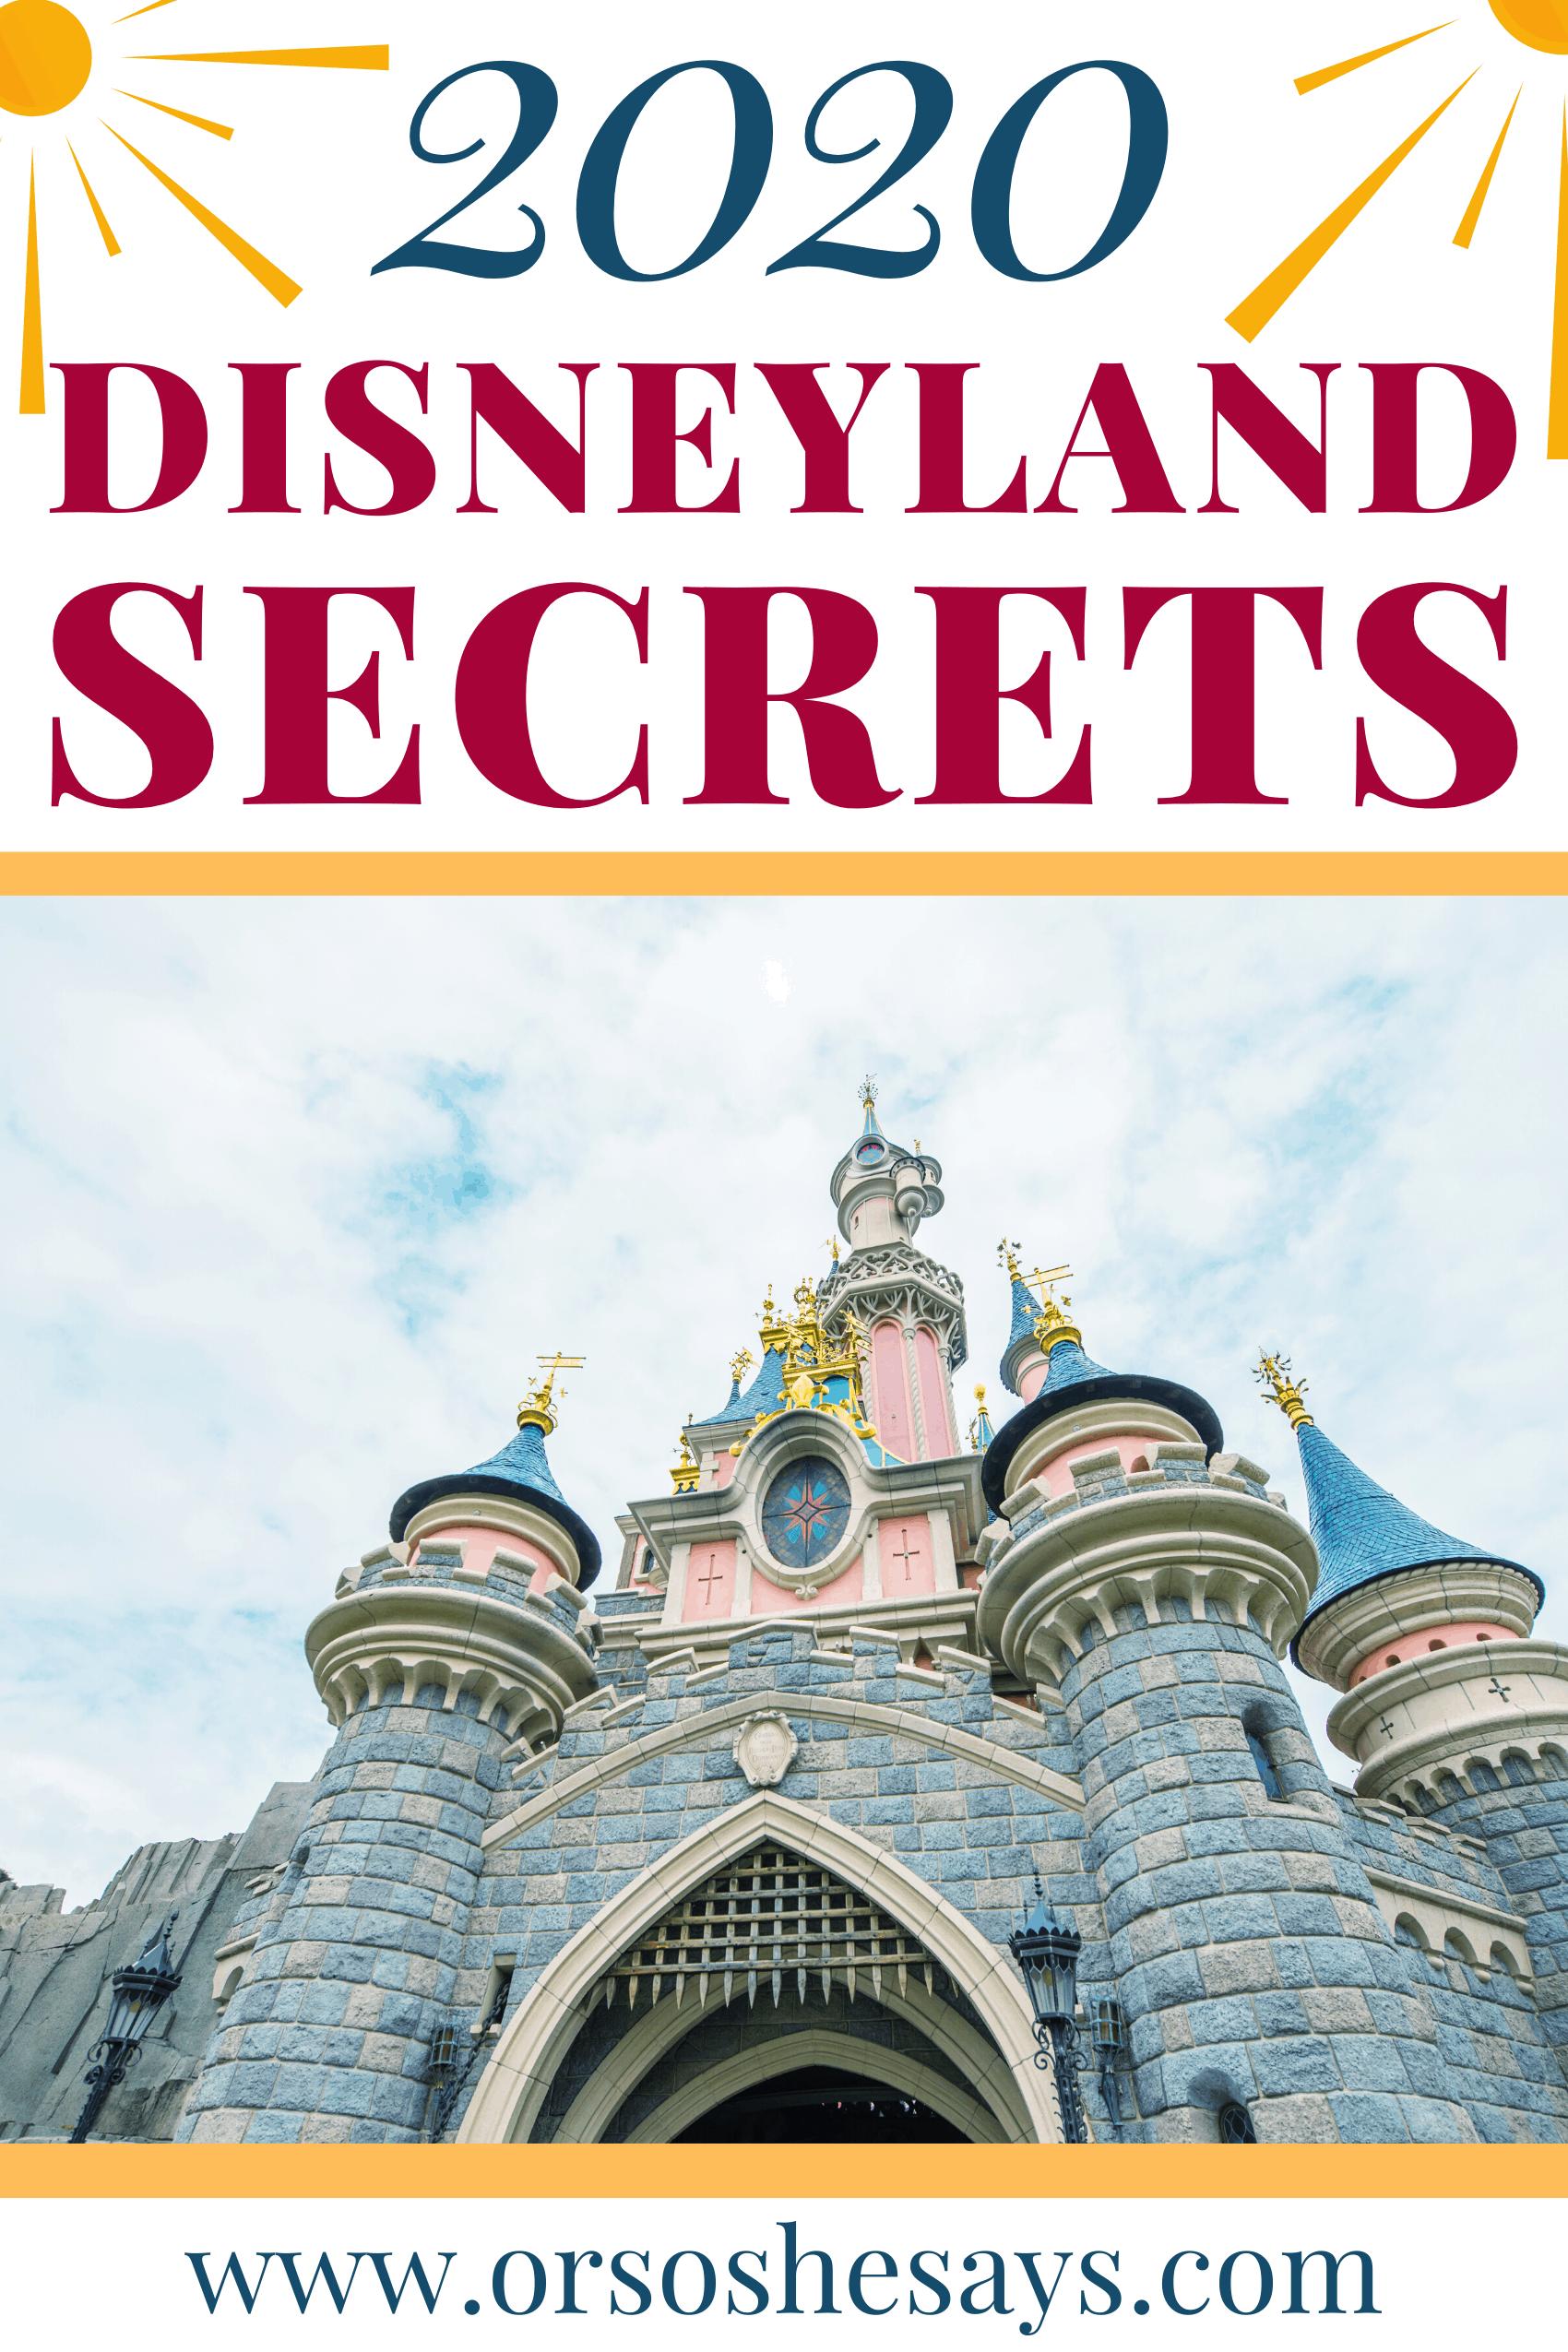 Disneyland tricks